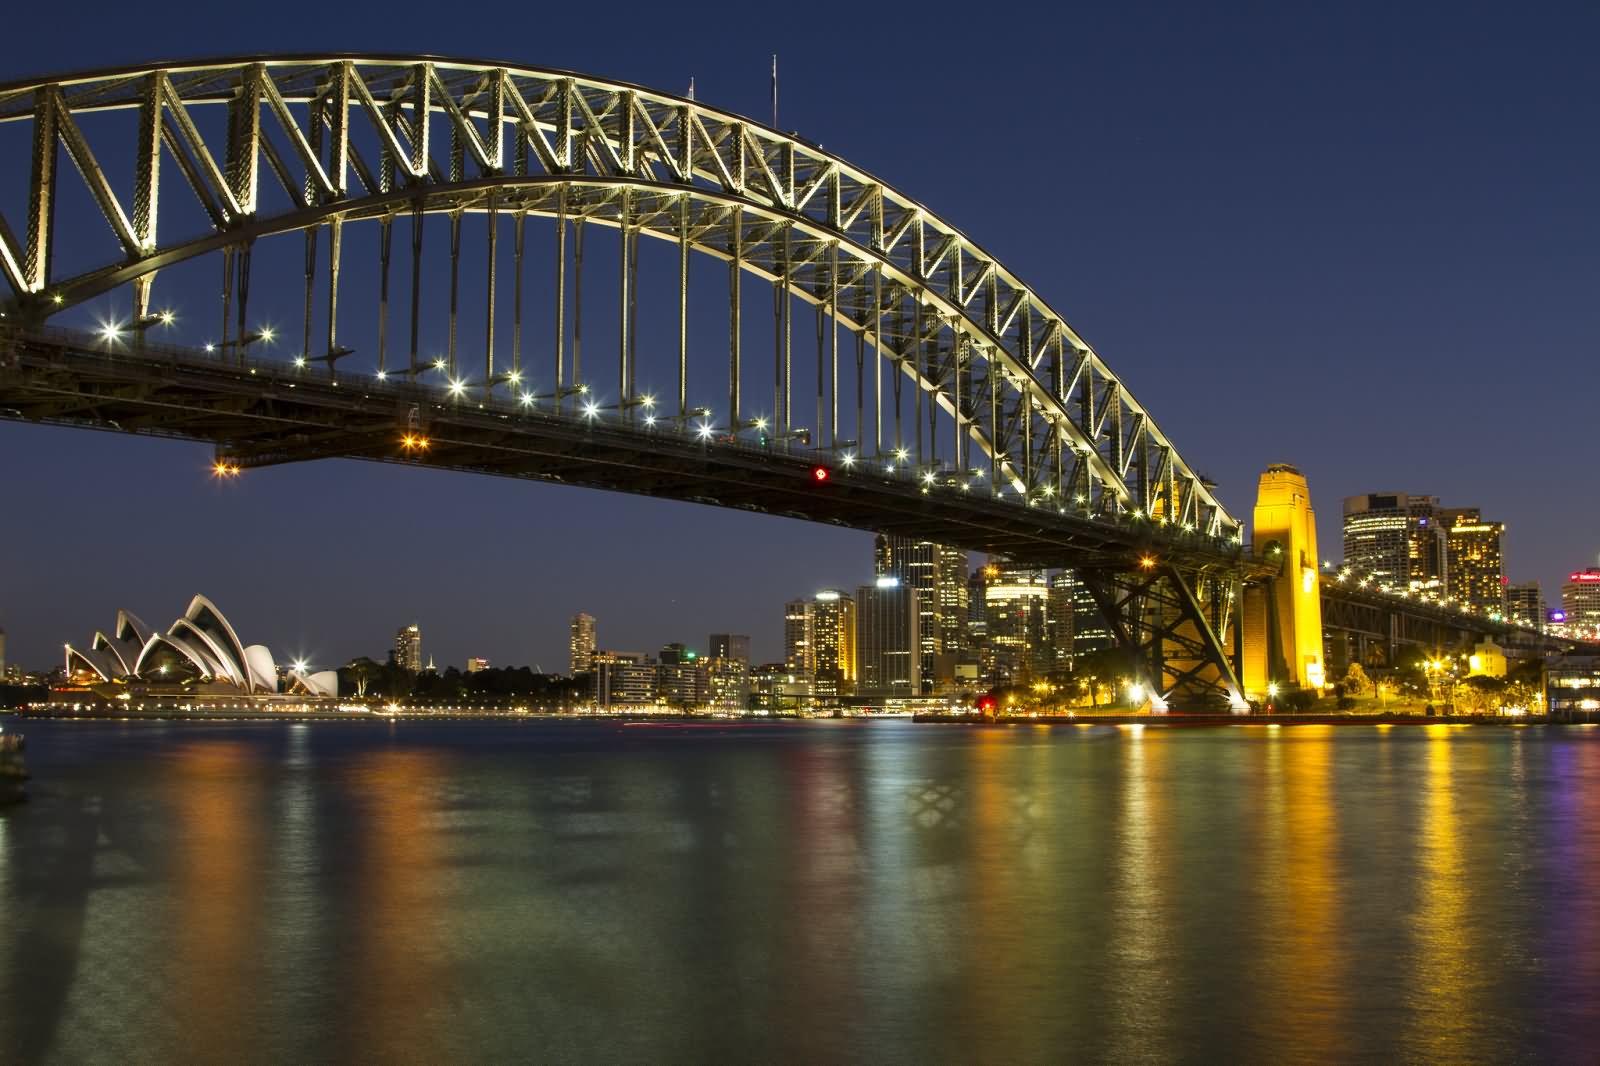 20 Sydney Harbour Bridge Night View Pictures And Photos